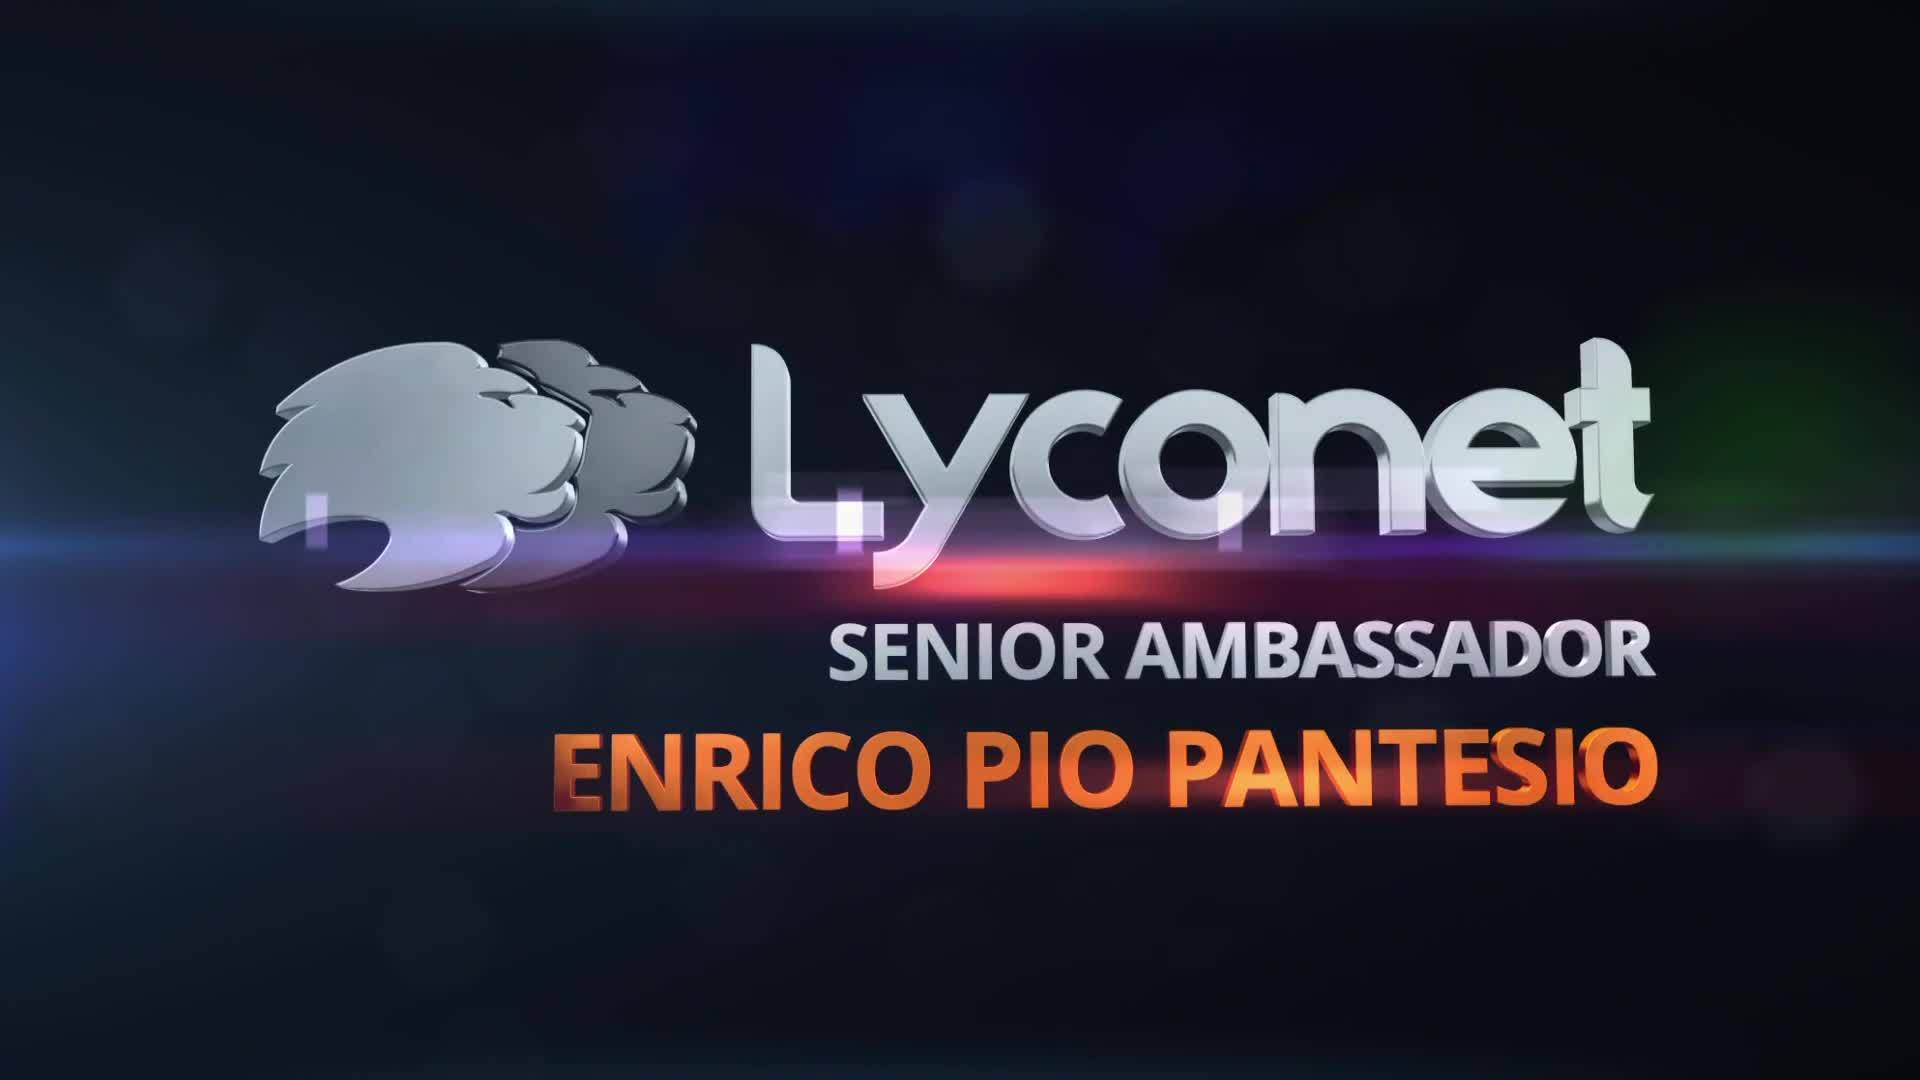 Senior Ambassador - Enrico Pio Pantesio